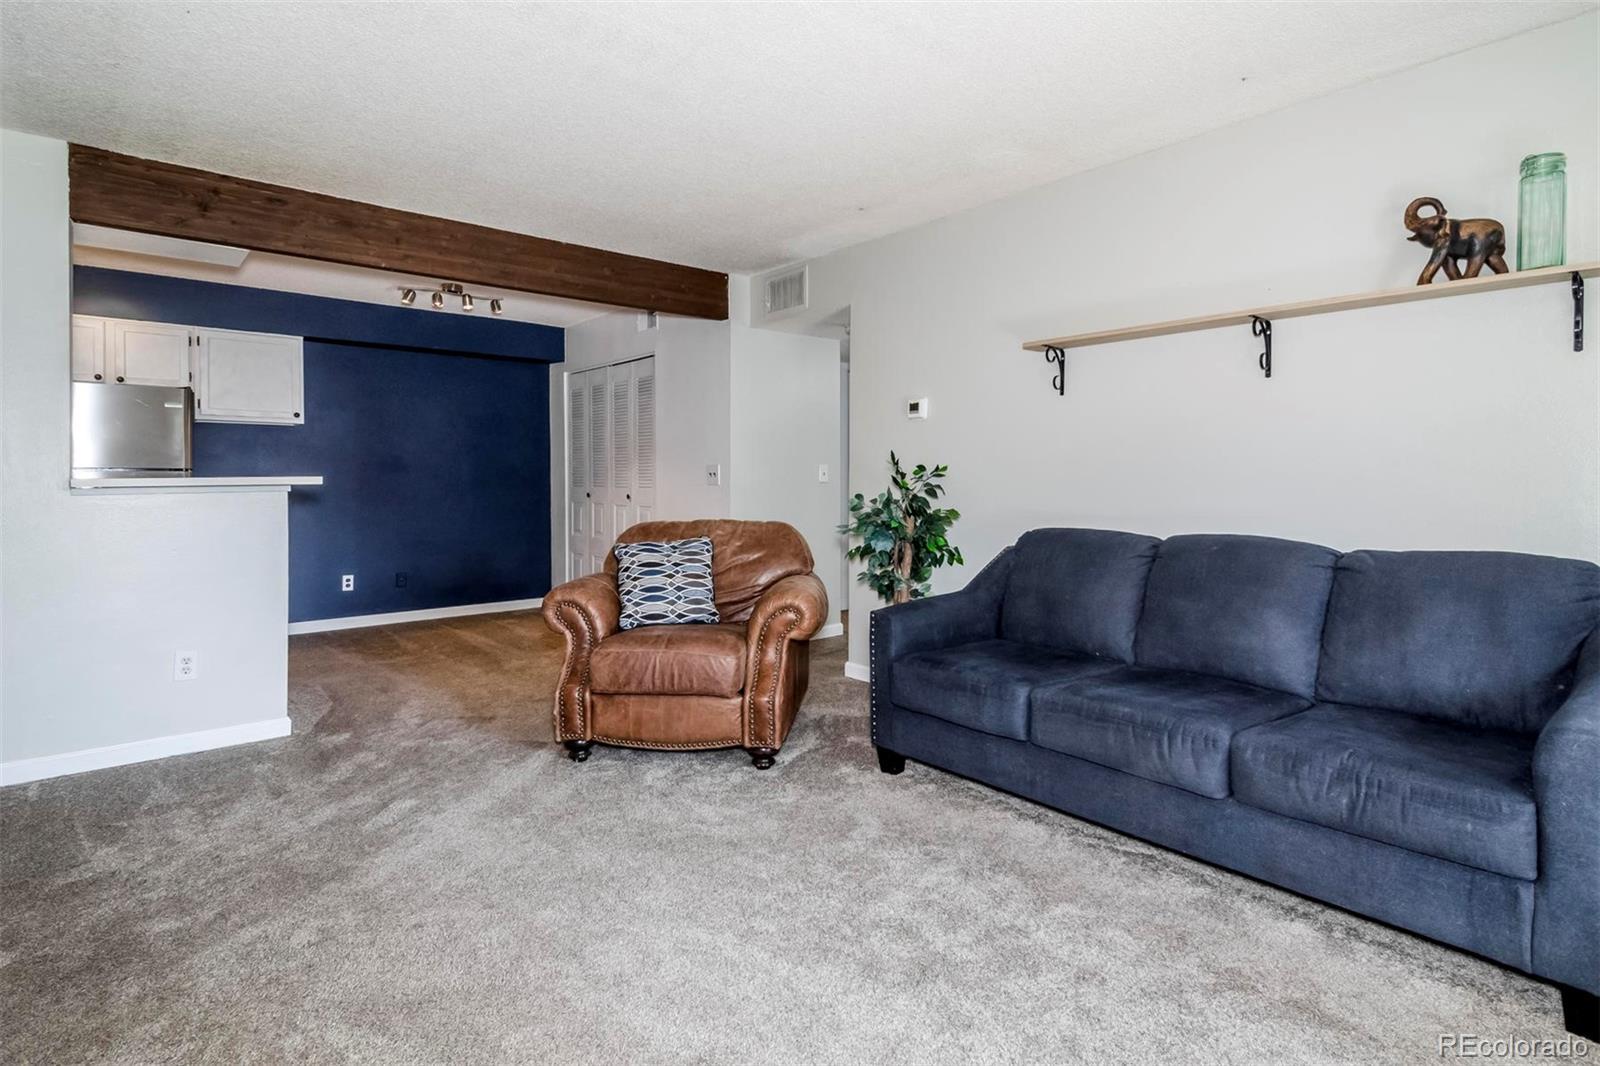 MLS# 6340316 - 5 - 420 Zang Street #3-102, Lakewood, CO 80228